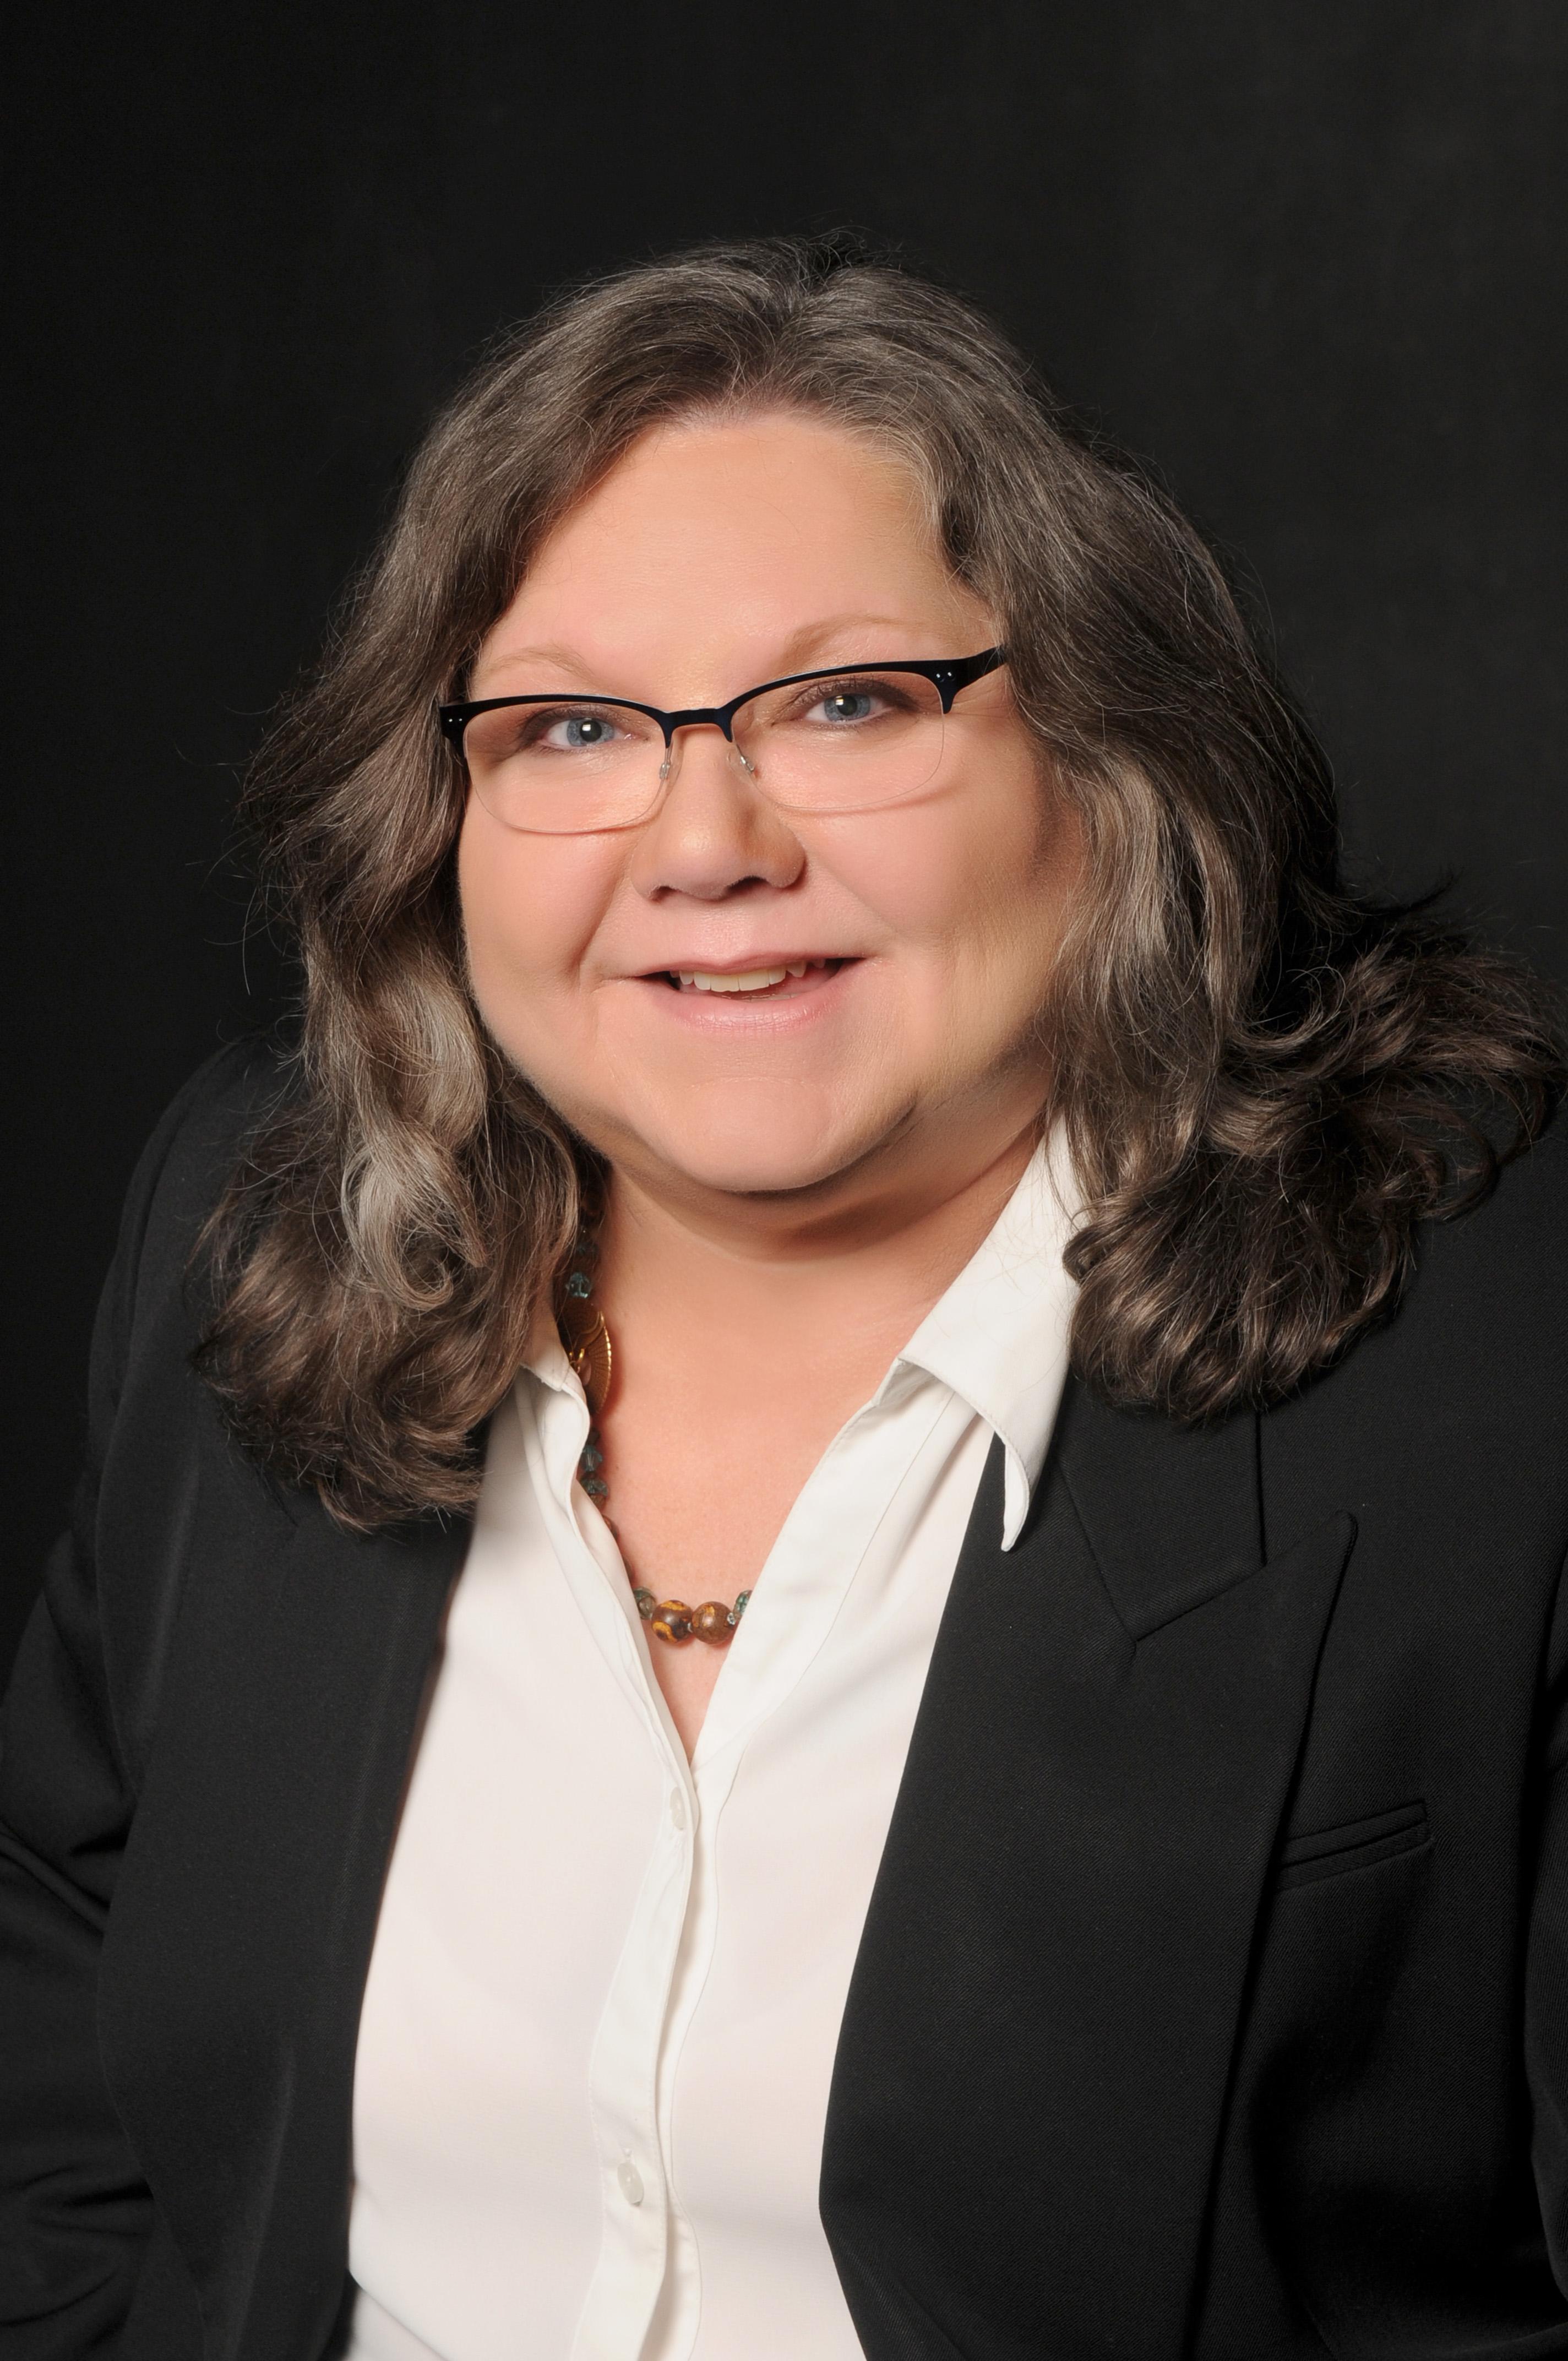 Lori Kauzlarich, CPOP